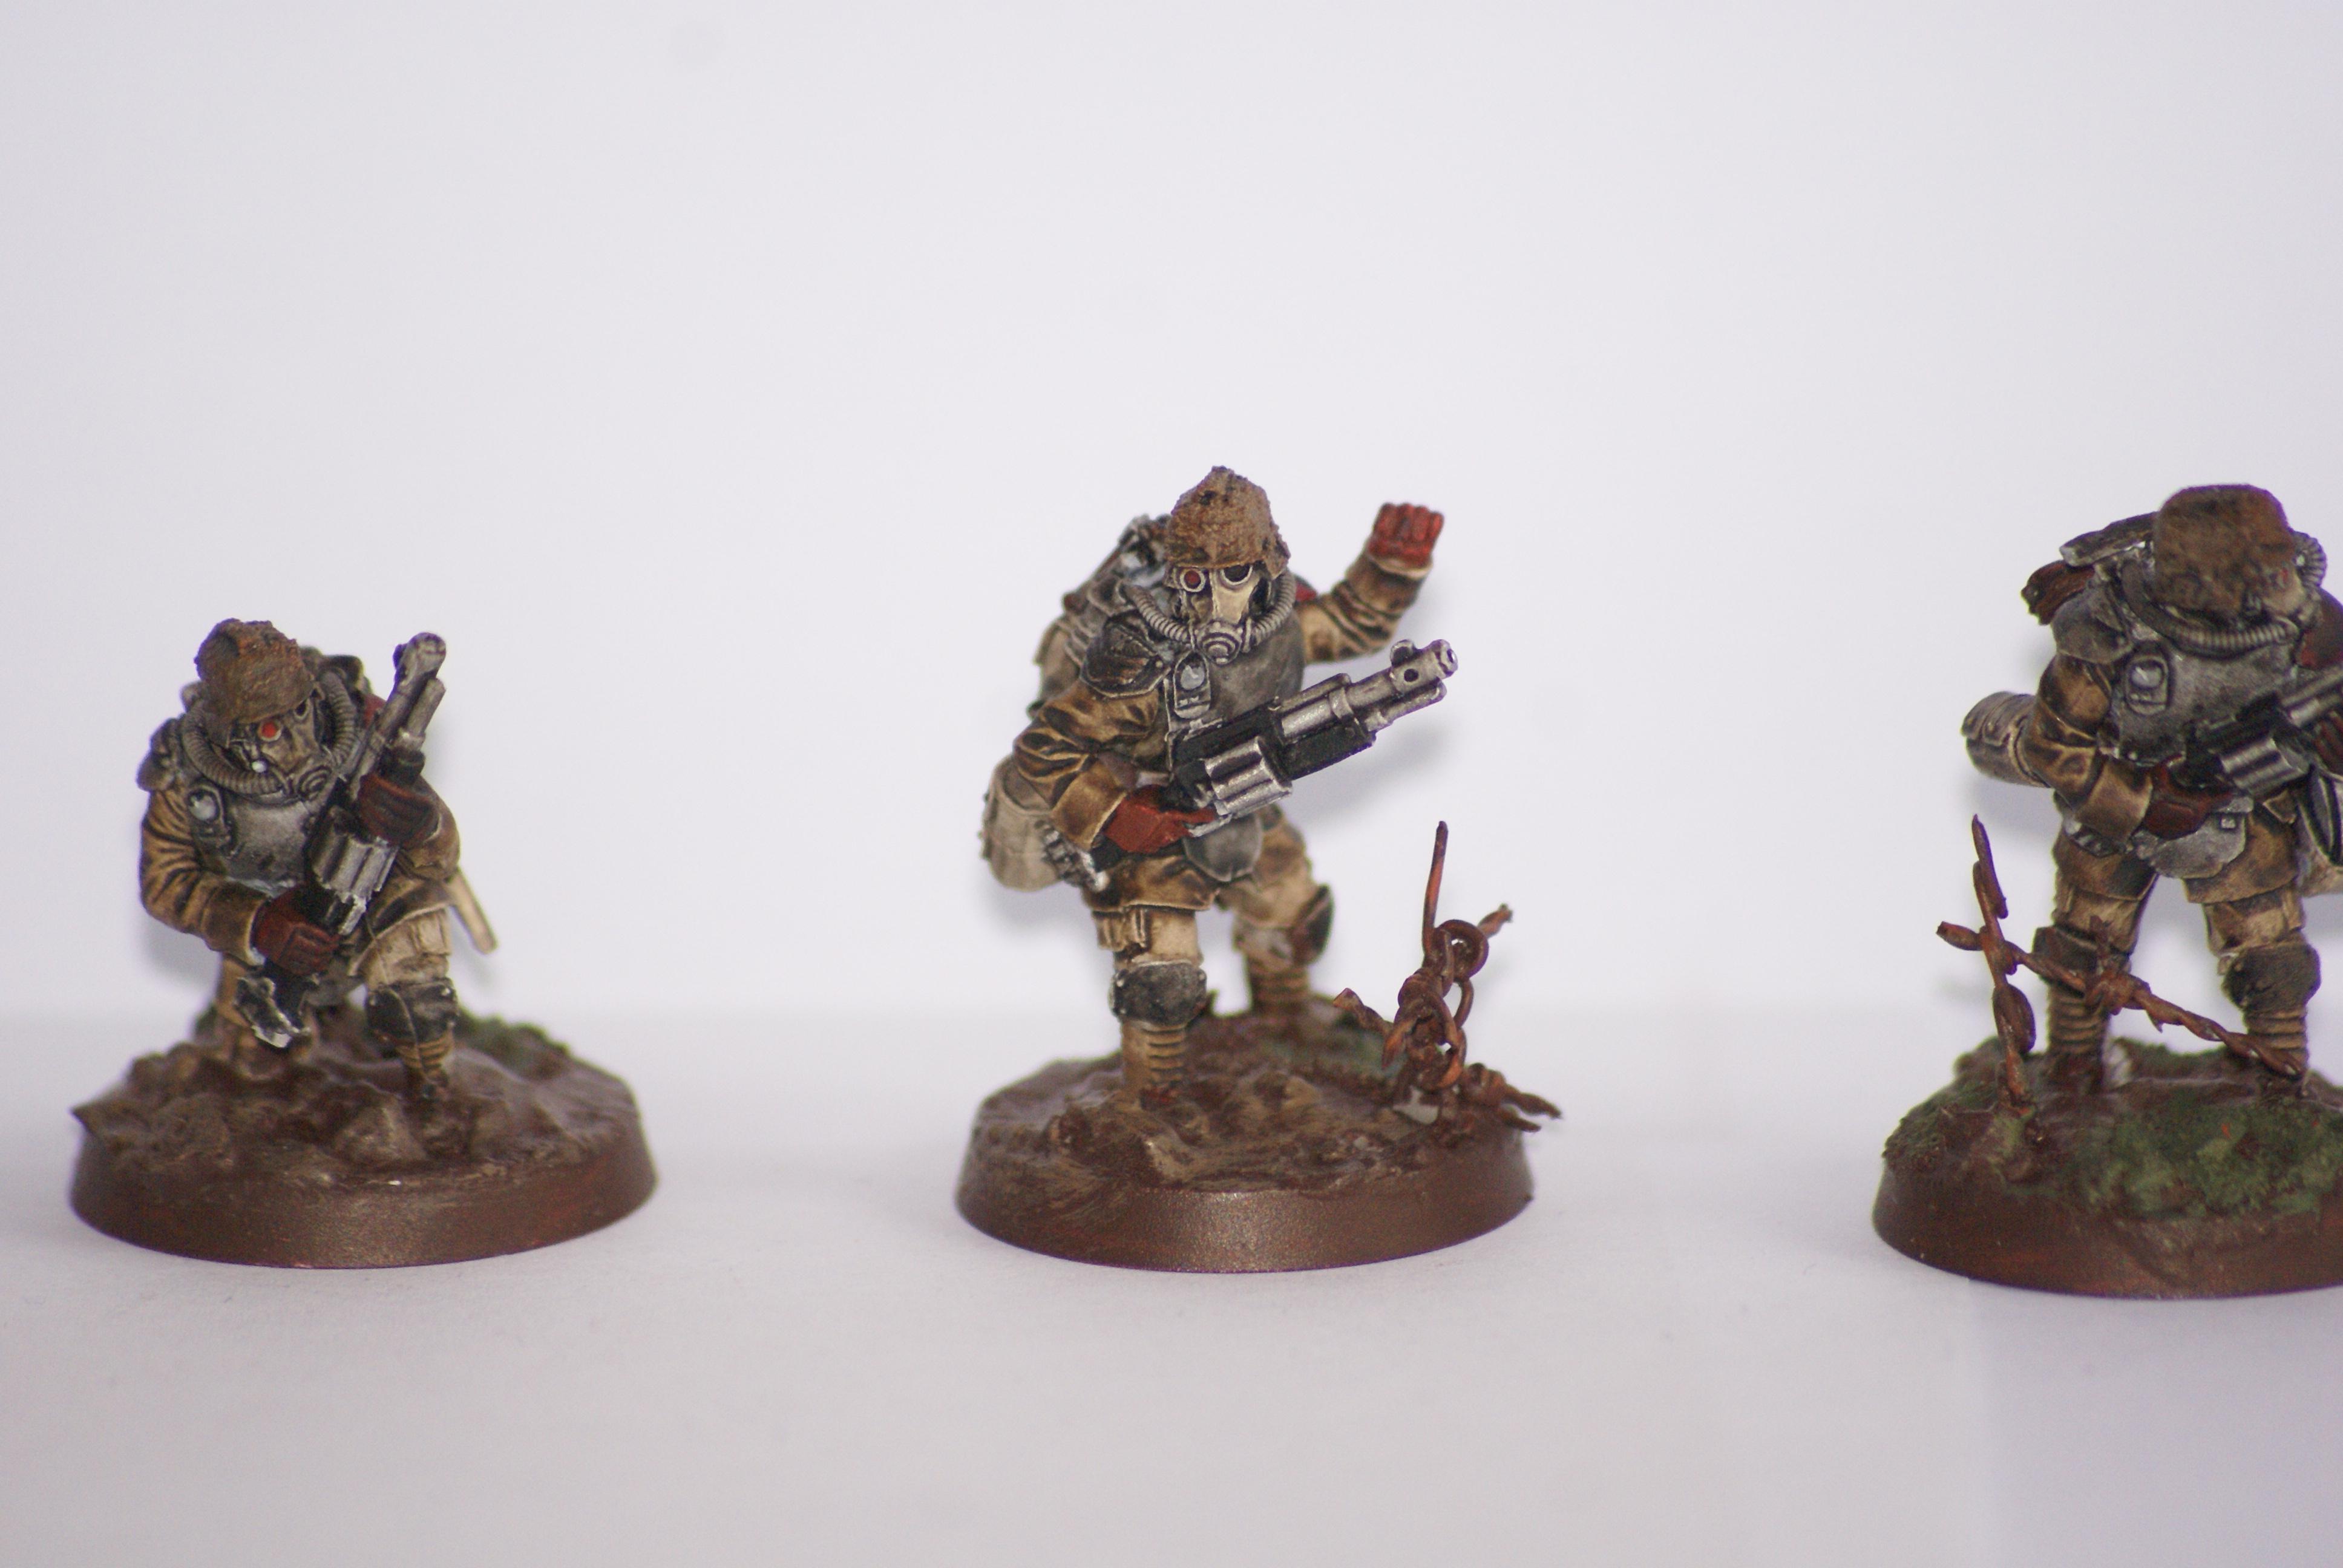 Death Korps of Krieg, Deathkorps, Engineer, Imperial Guard